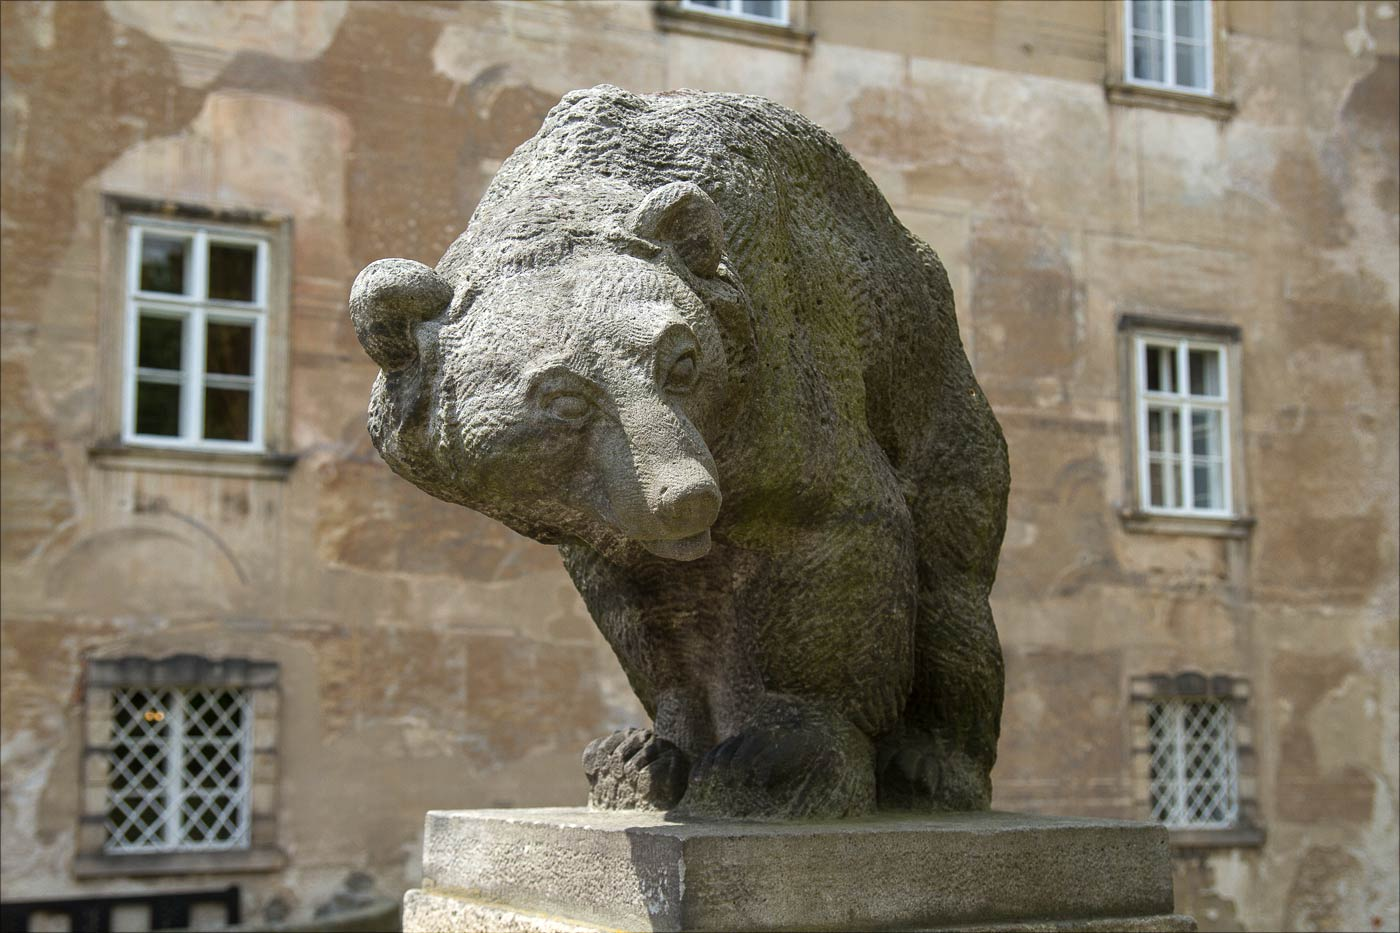 Статуя медведя у замка Нове Место над Метуйи